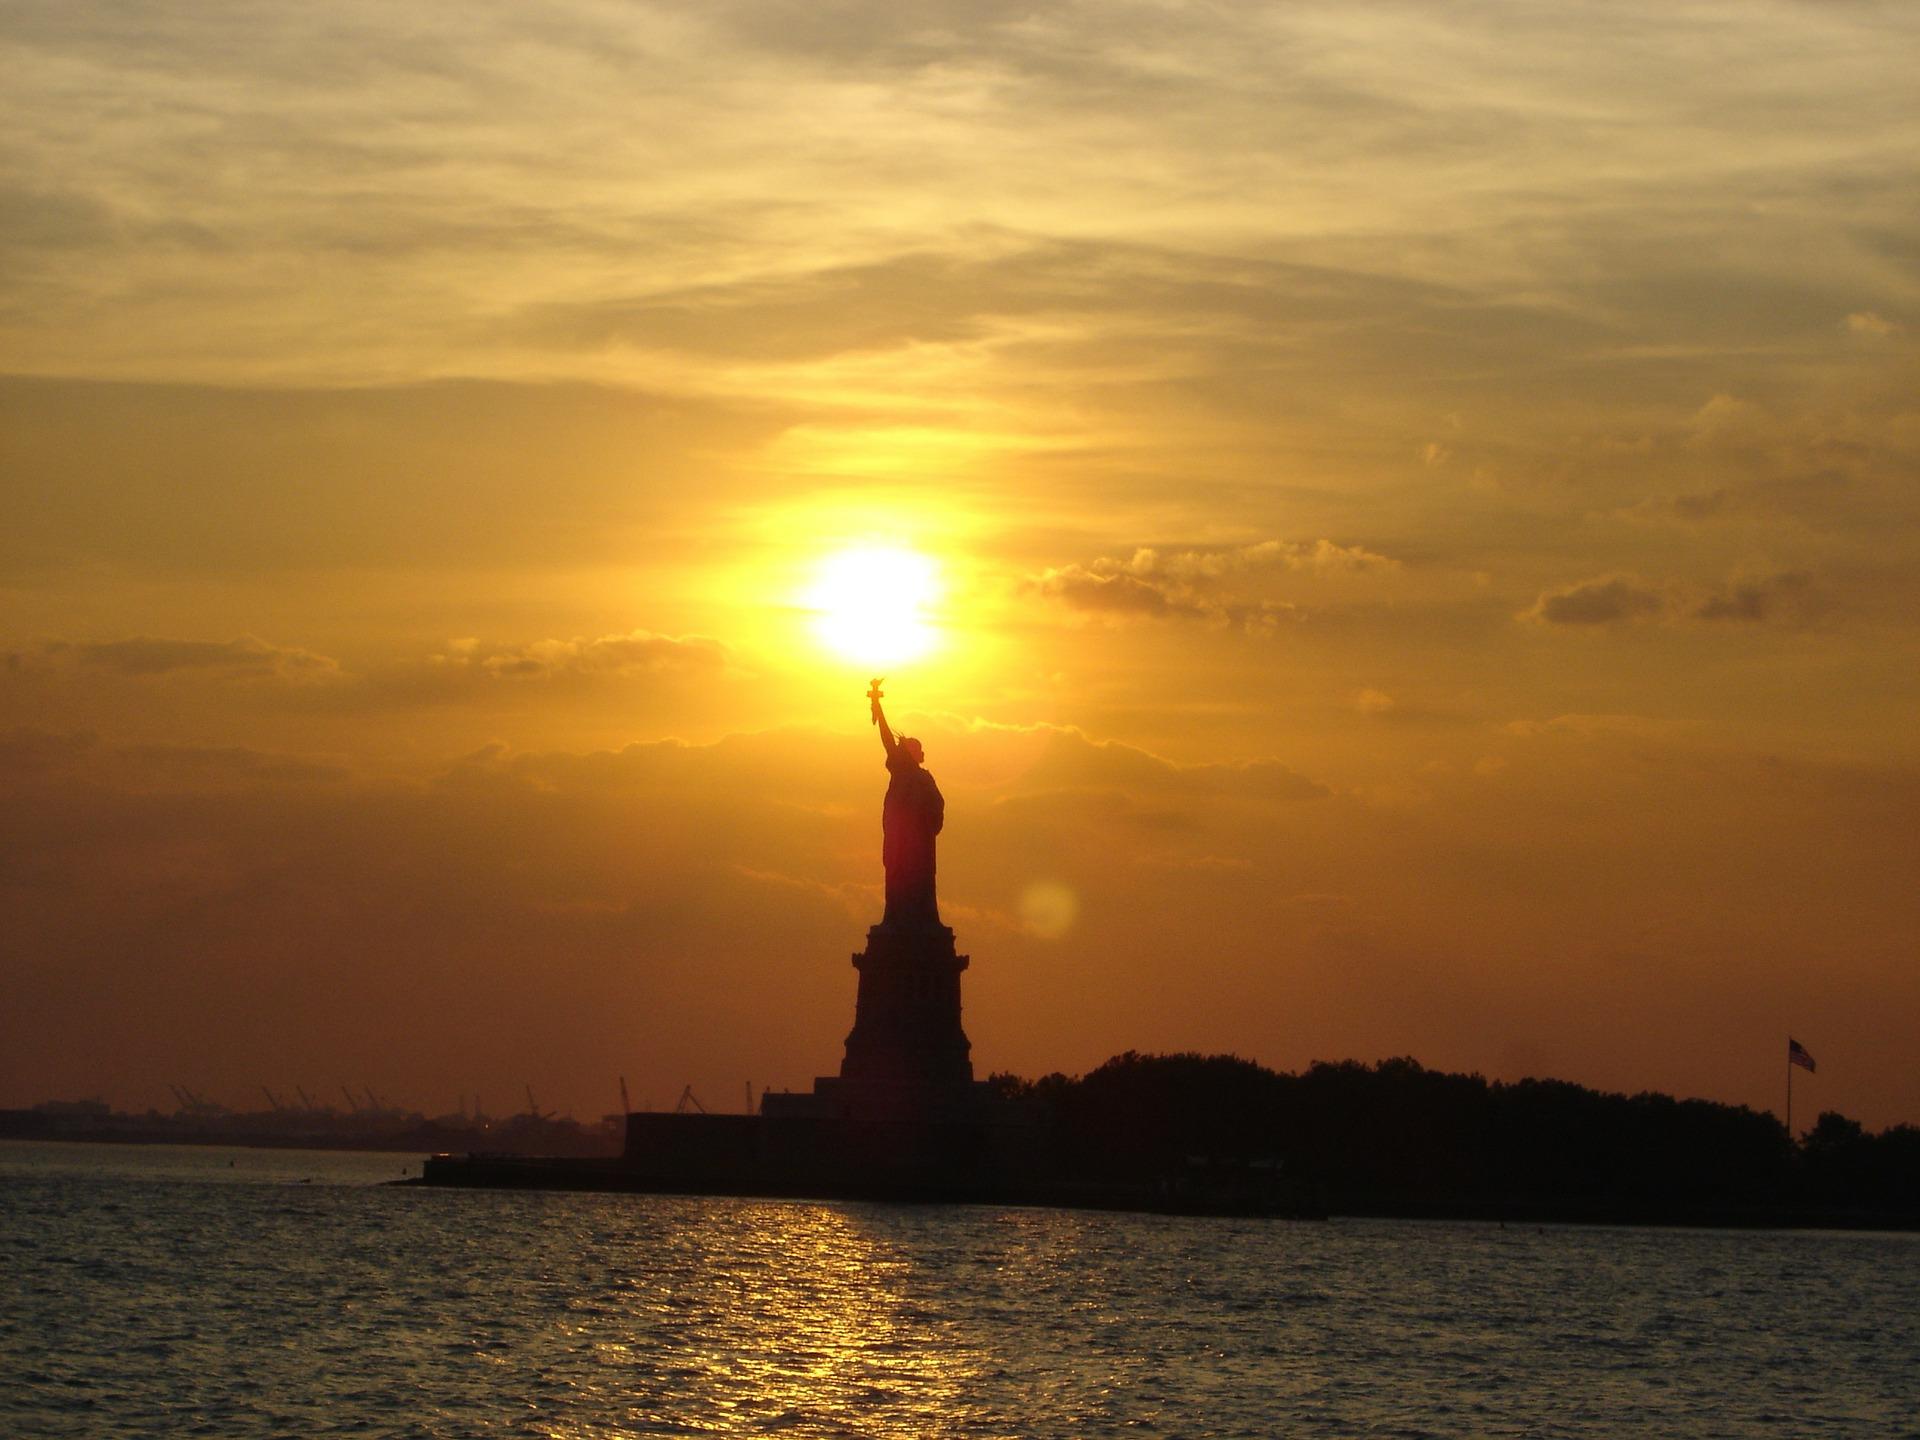 Statue of liberty, new york city, sunset